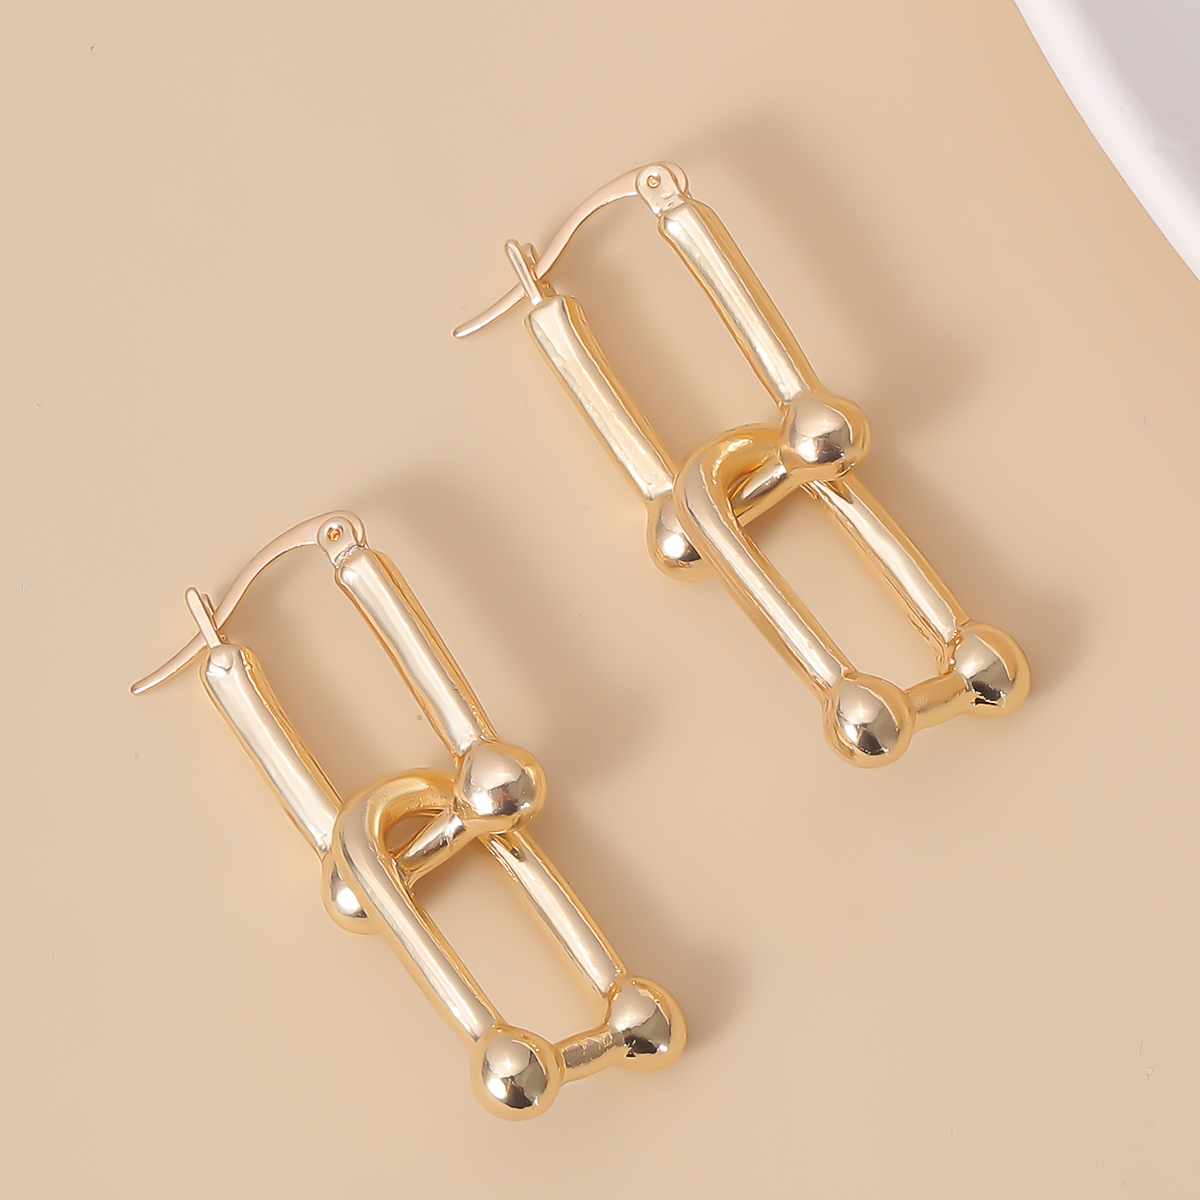 Punk Thick Link U Shape Drop Dangle Earrings Retro Geometric Hollow Square Long Hanging Earrings for Women Jewelry